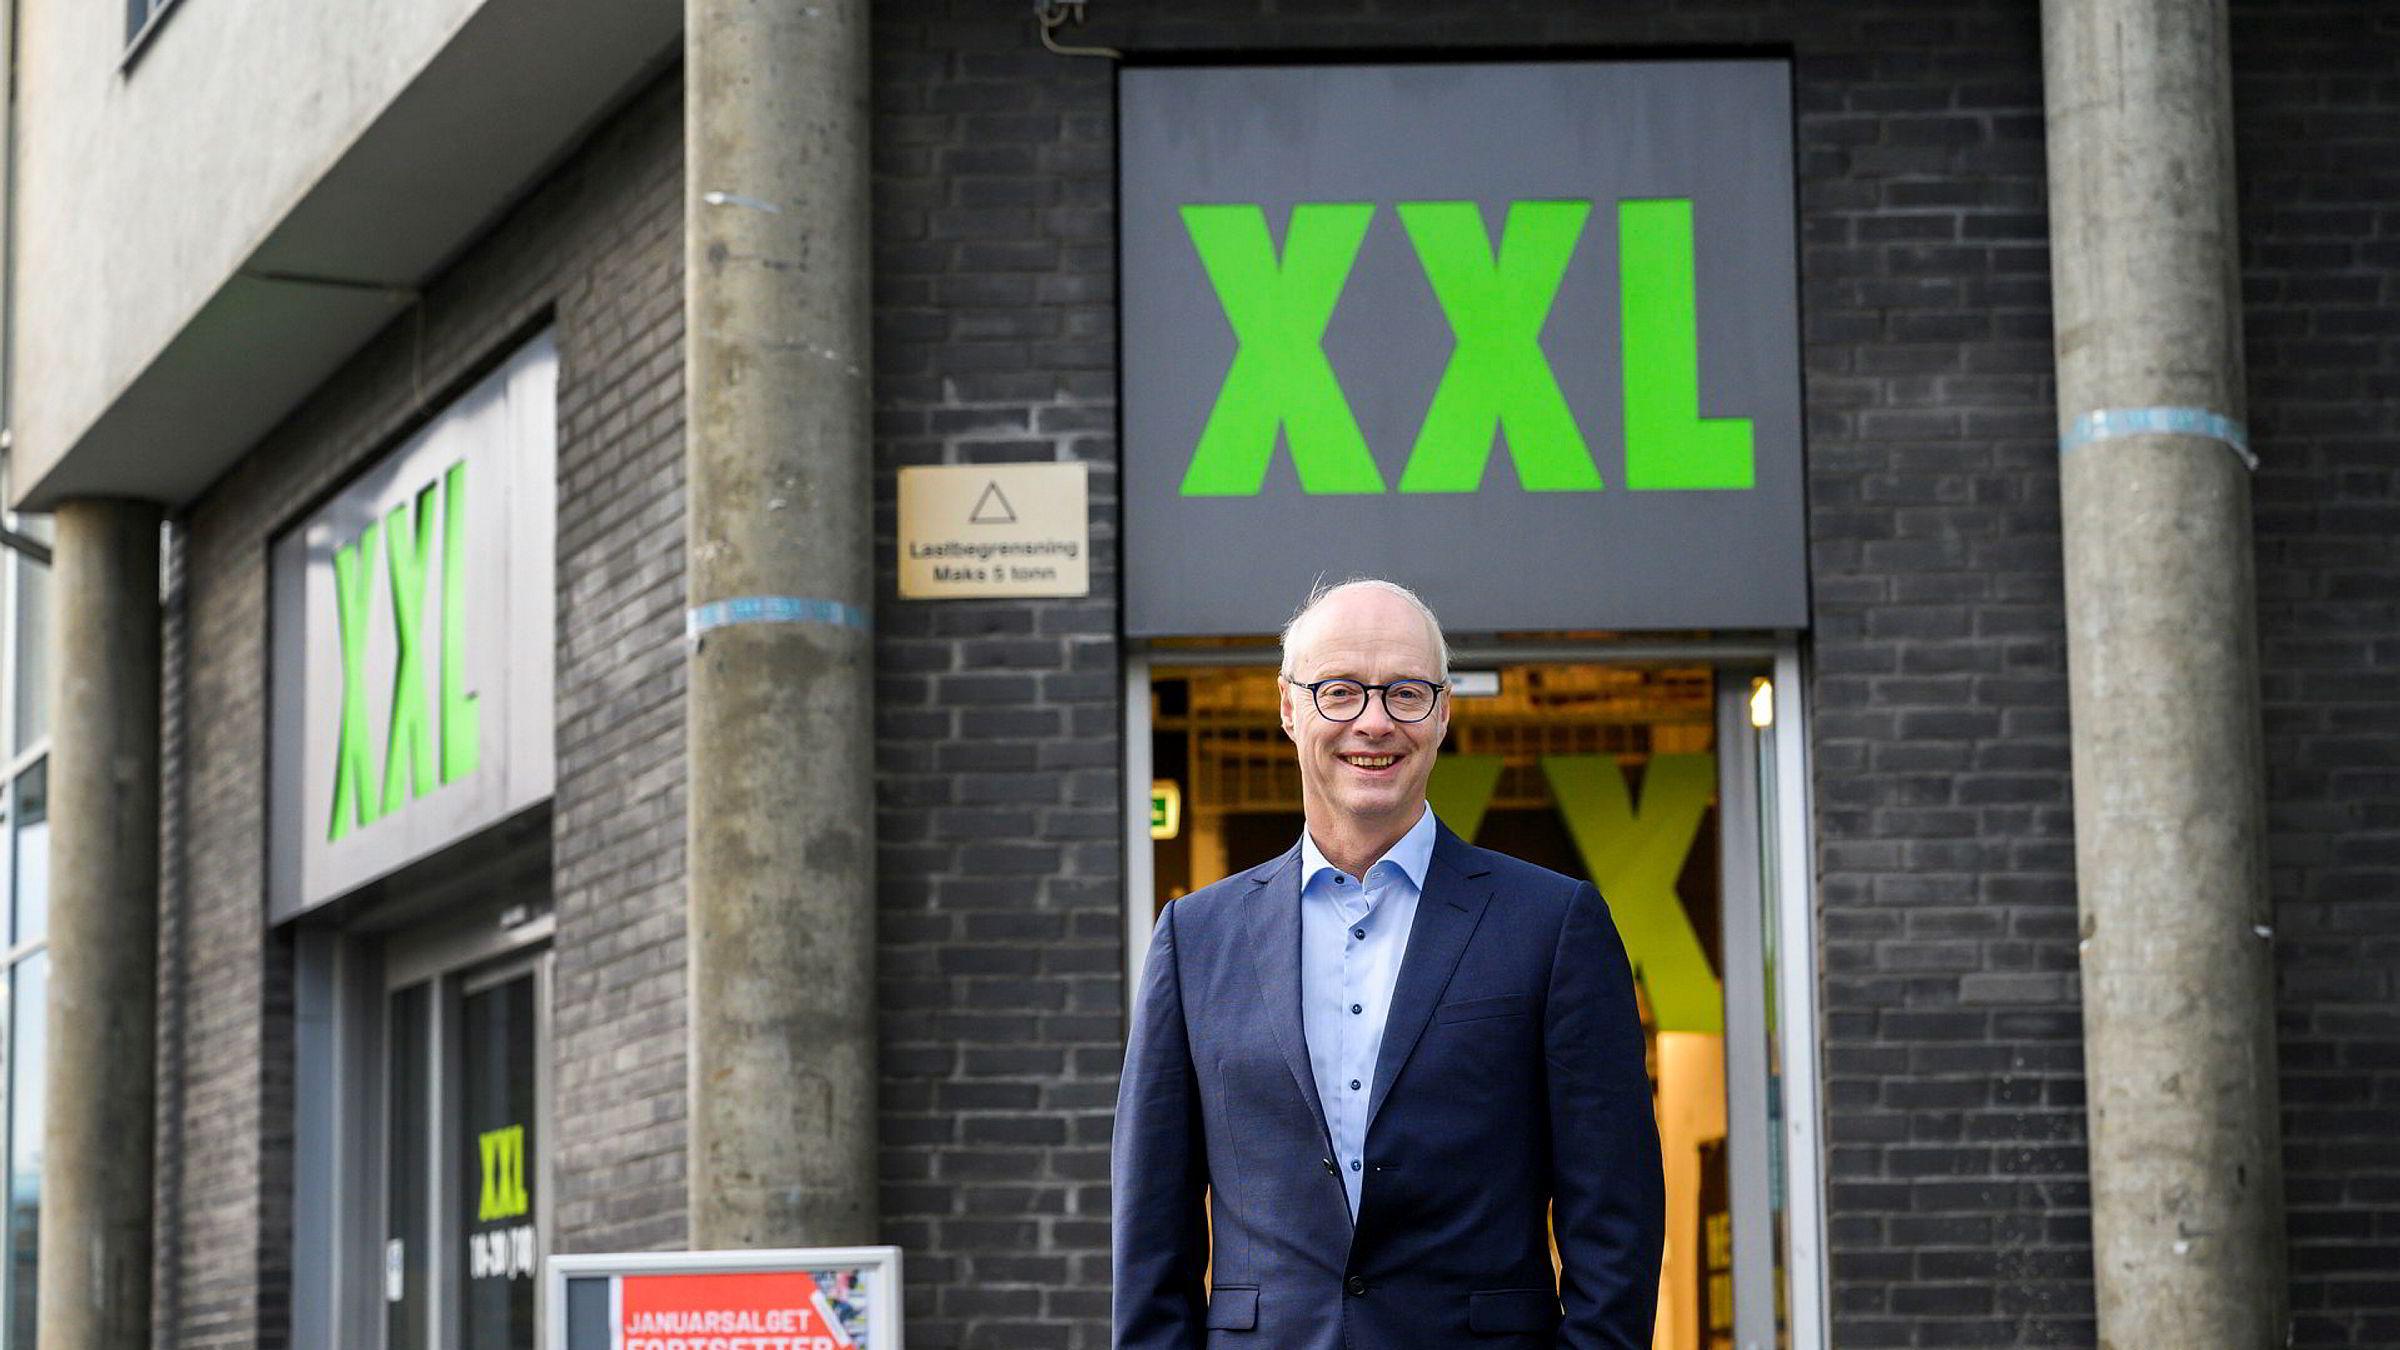 Europris-sjefen Pål Wibe blir ny XXL-sjef.